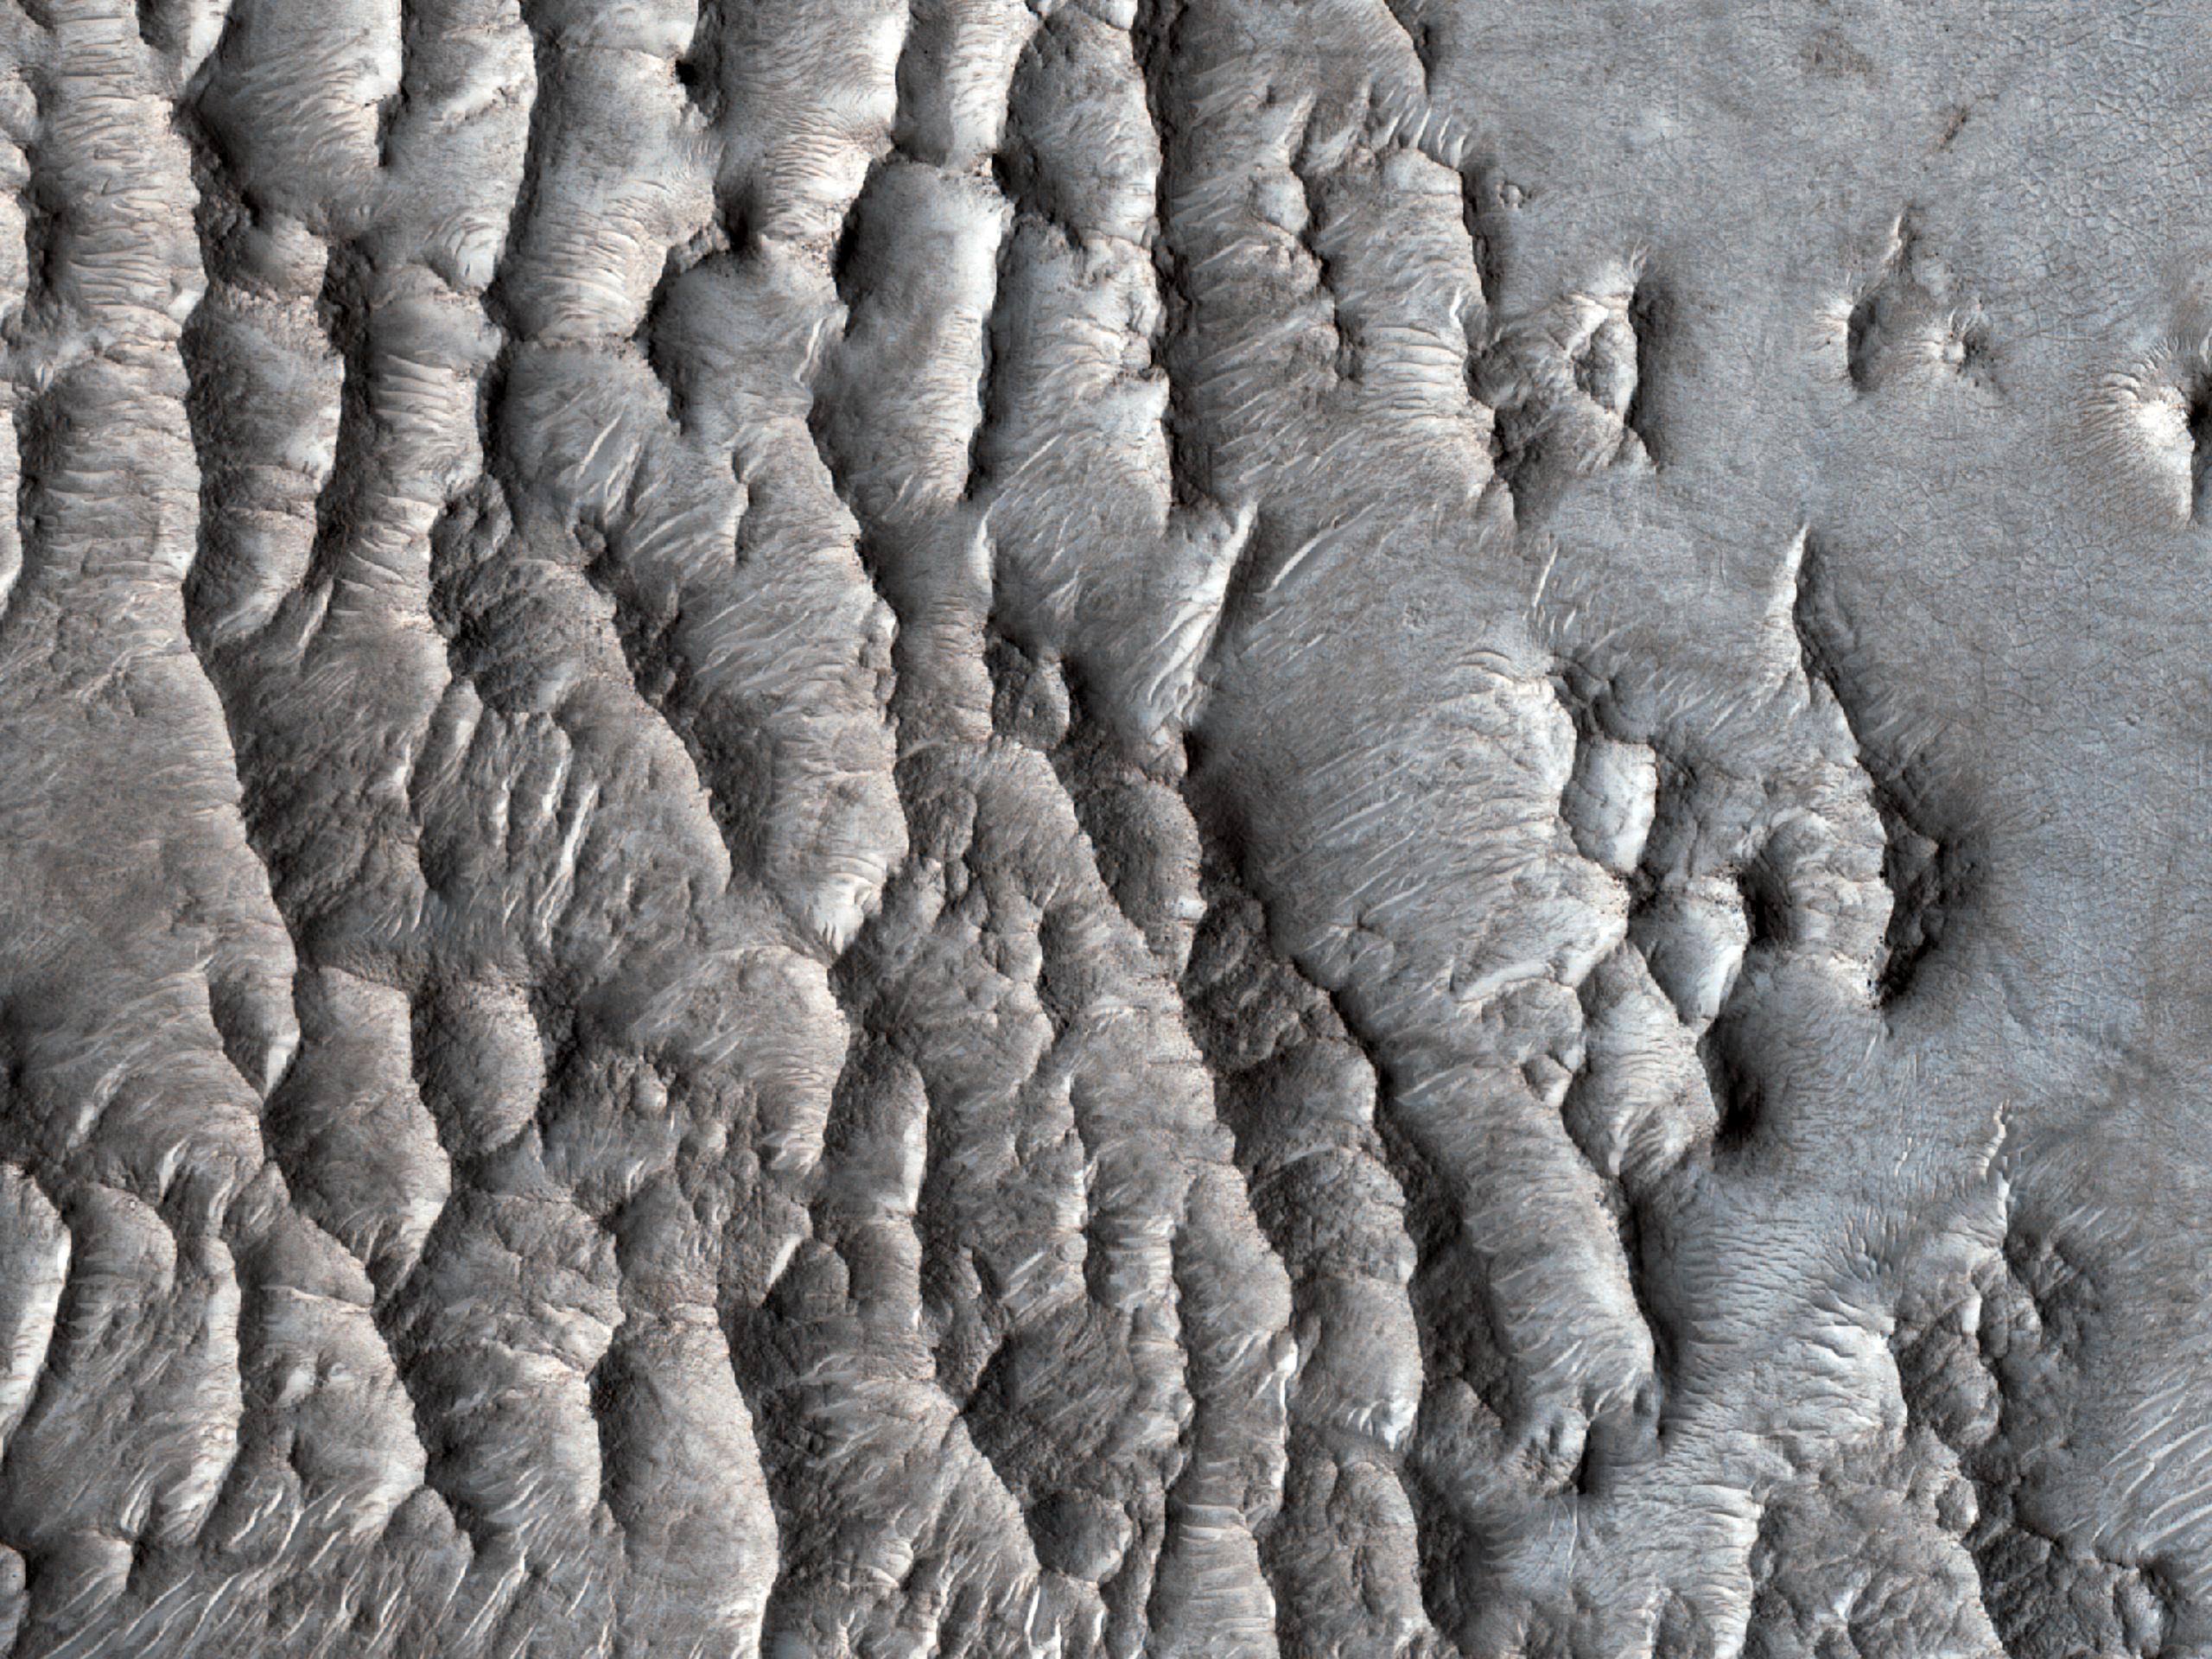 Impact Structure in Eastern Arabia Terra